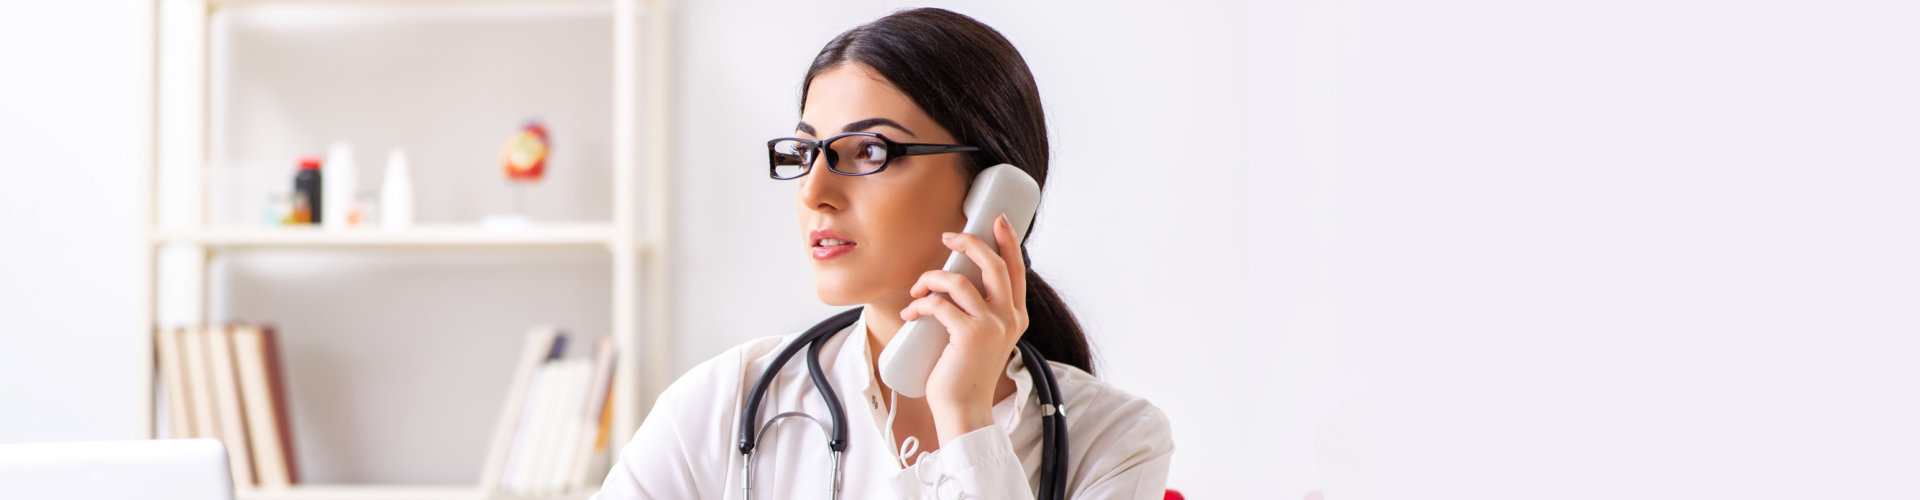 nurse answering her phone